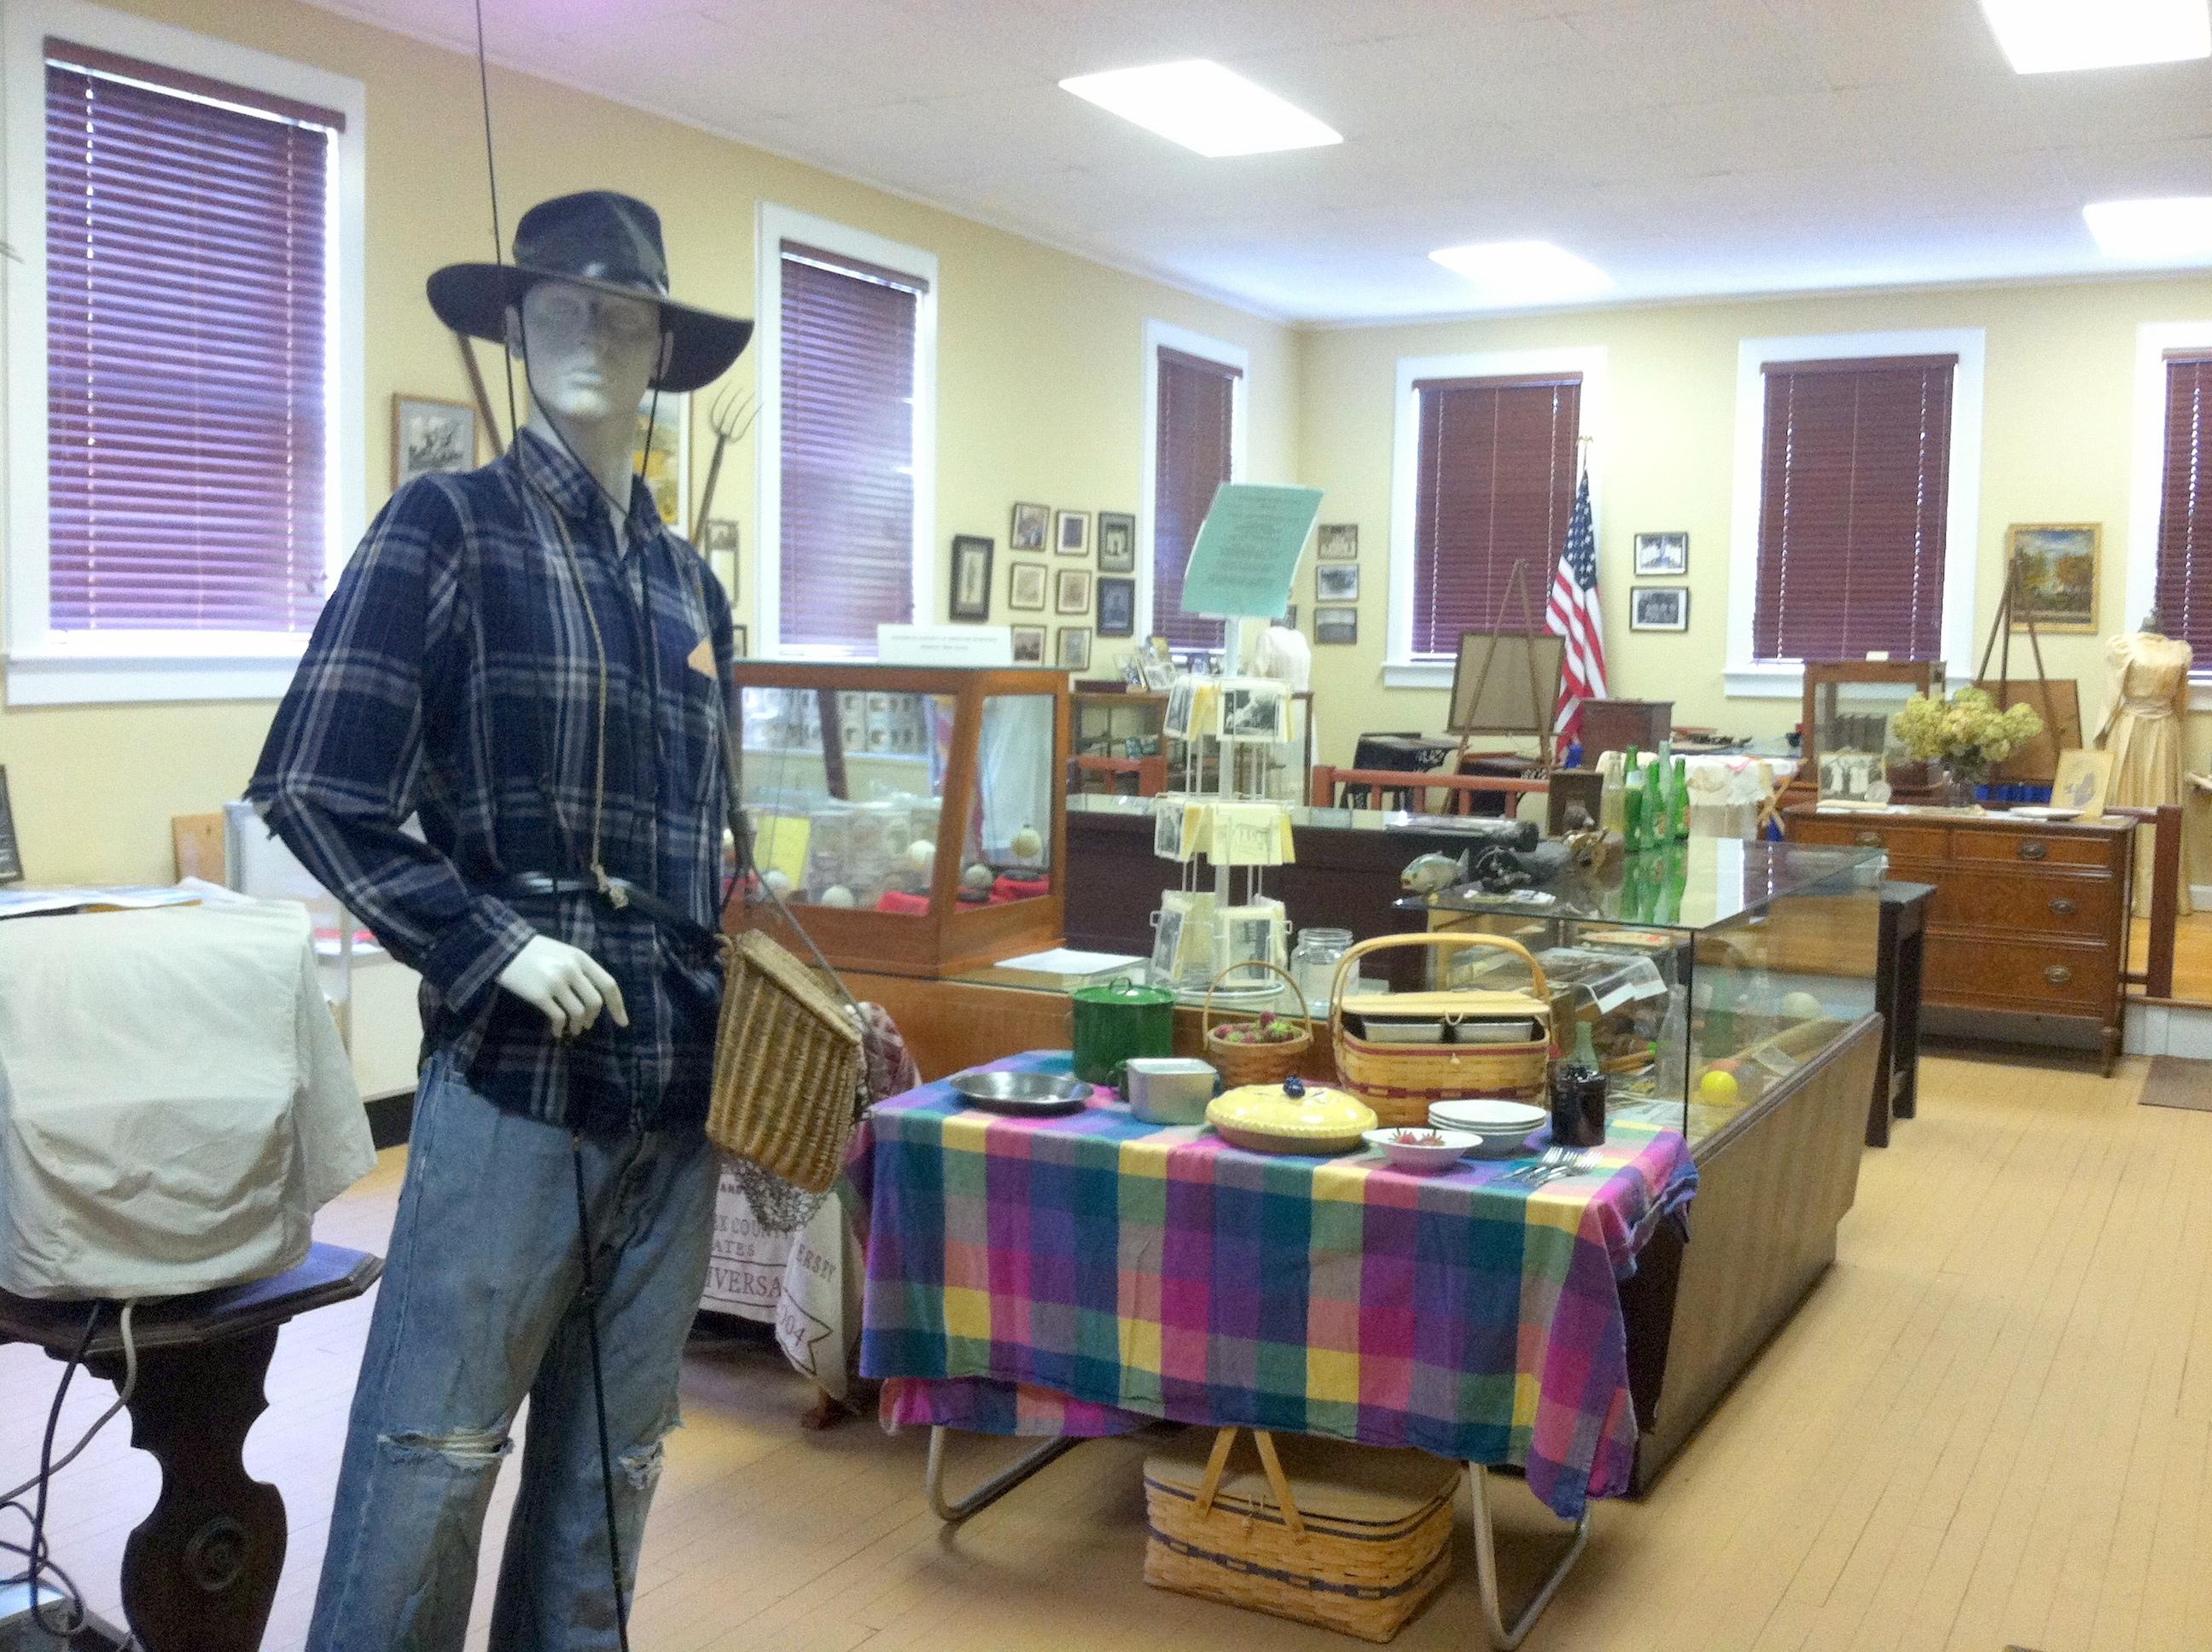 Historical Andover Borough - Hopatcong NJ News - The Alternative Pressandover borough